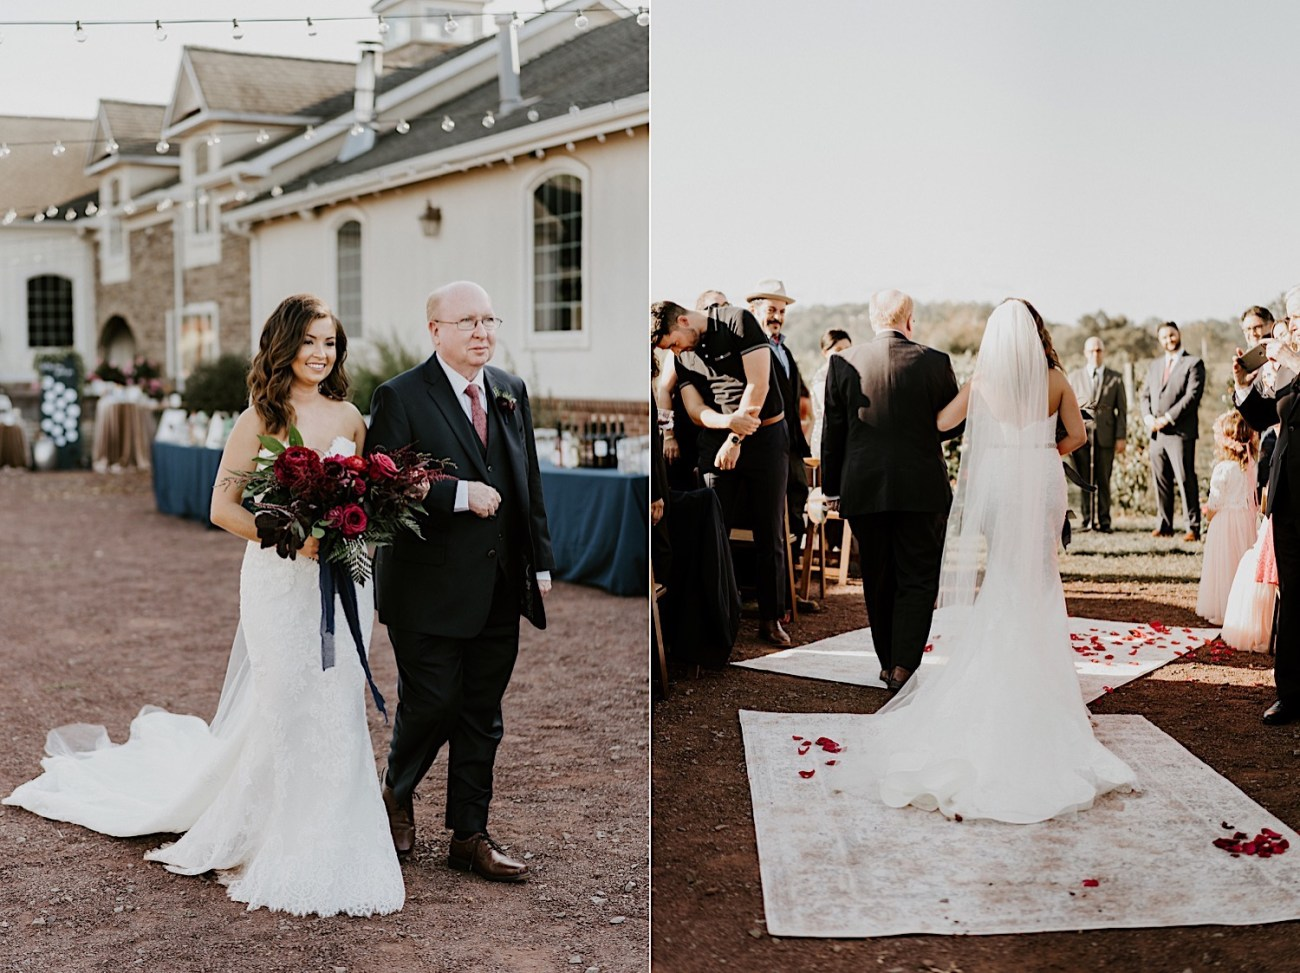 Hopewell Valley Vineyards Wedding New Jersey Wedding Photographer 04